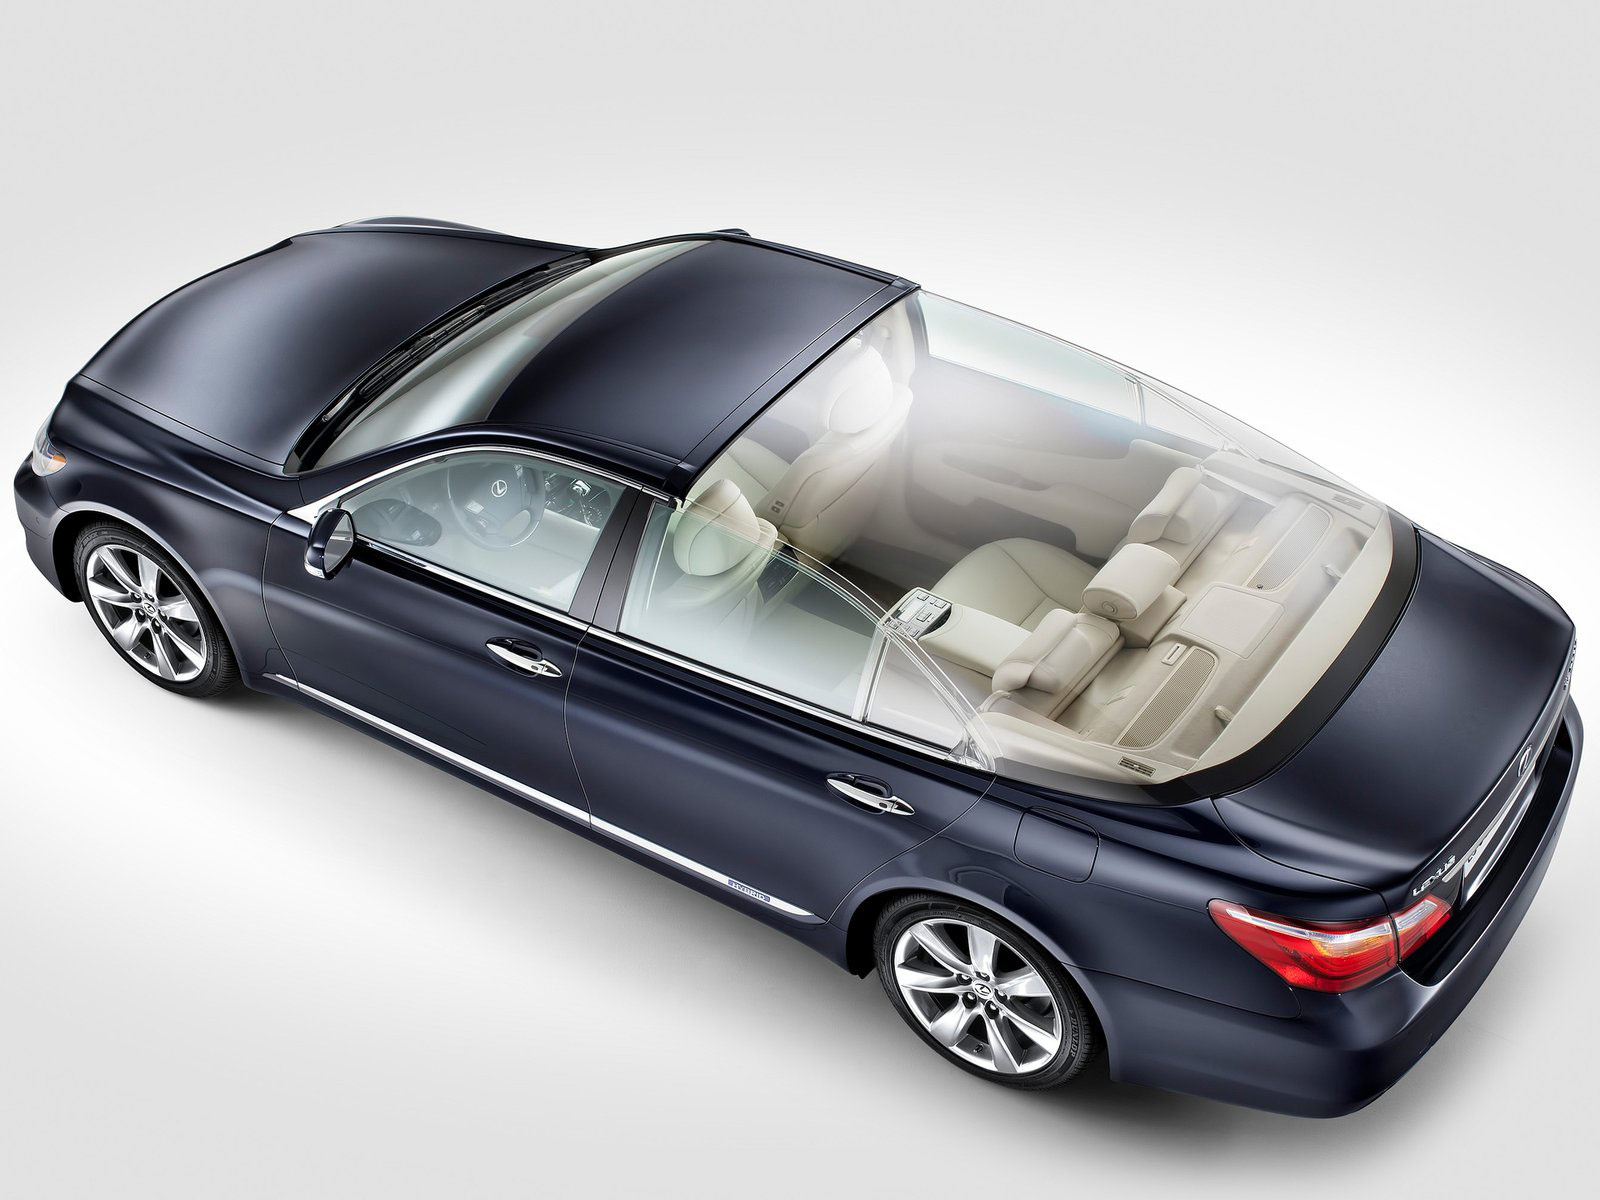 Lexus lf gh concept 2011 exterior detail 49 of 49 1600x1200 - A